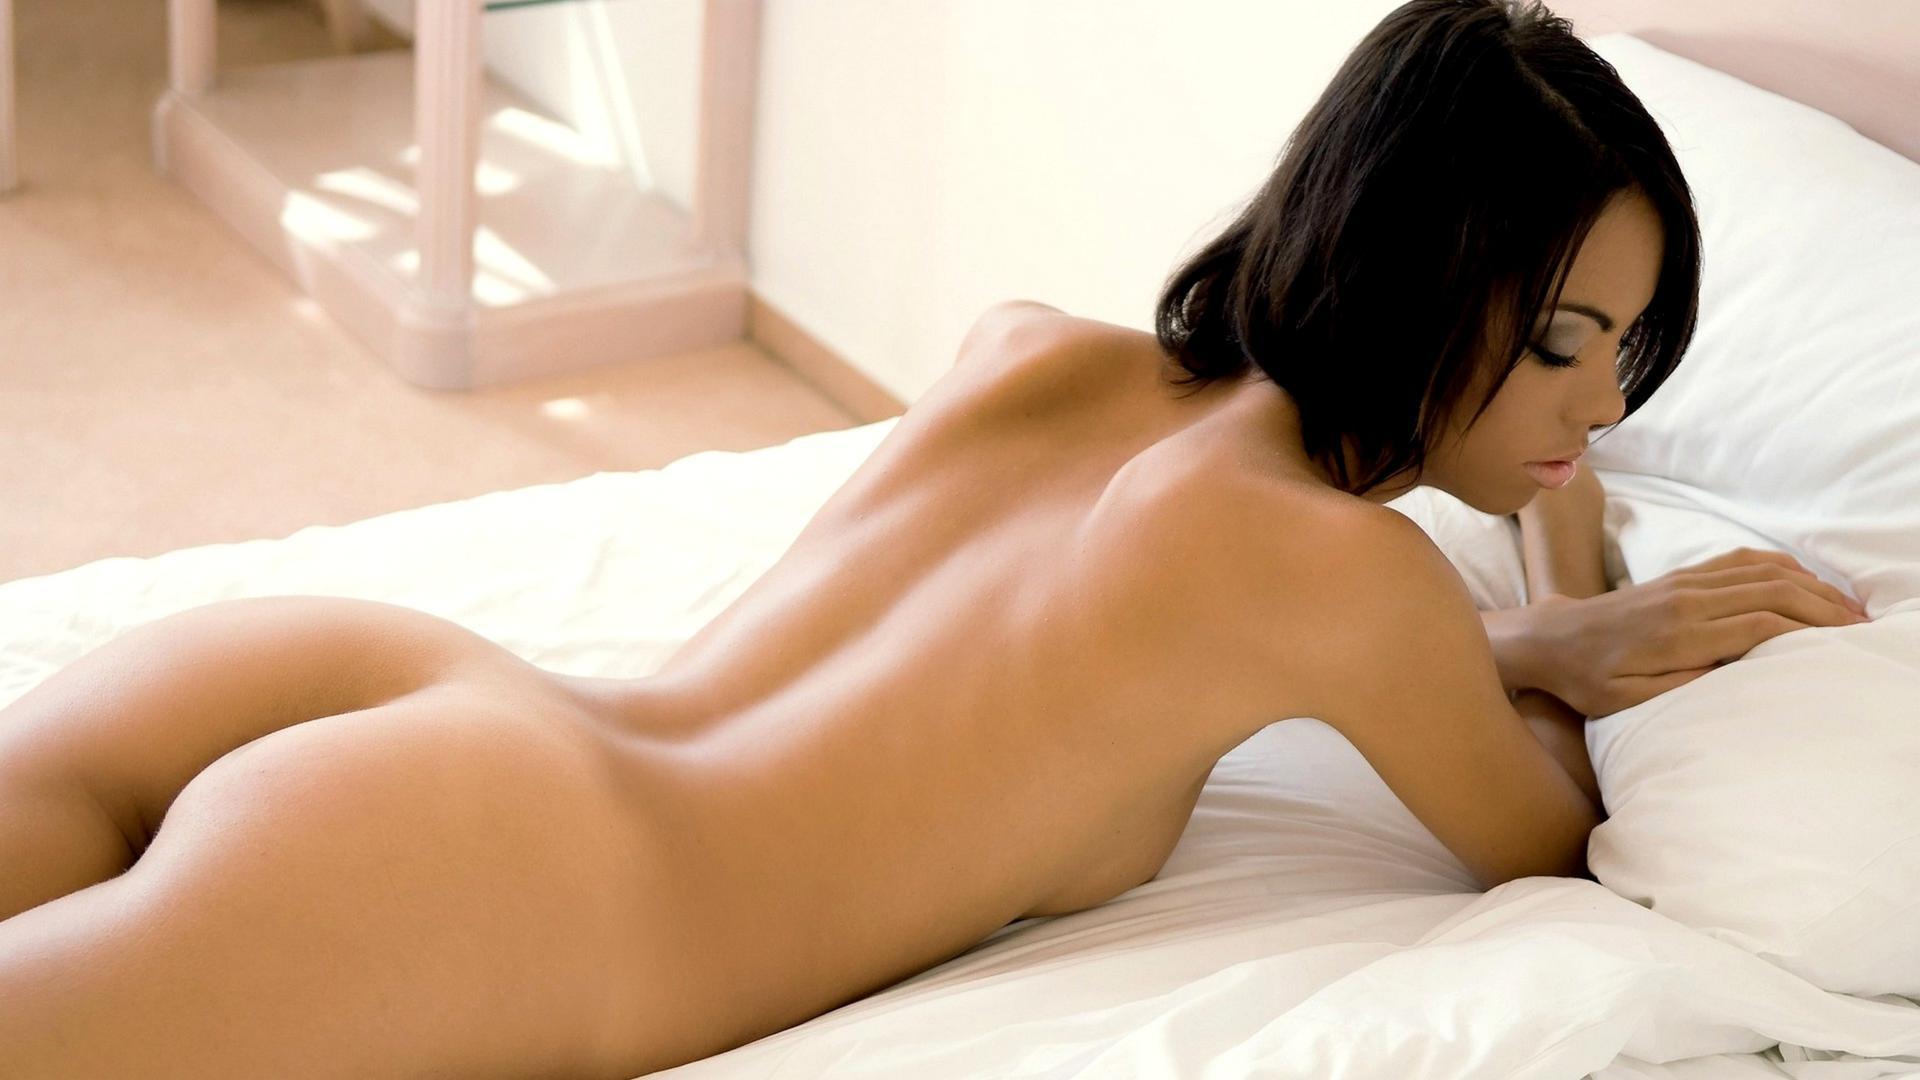 nude stockings mature women